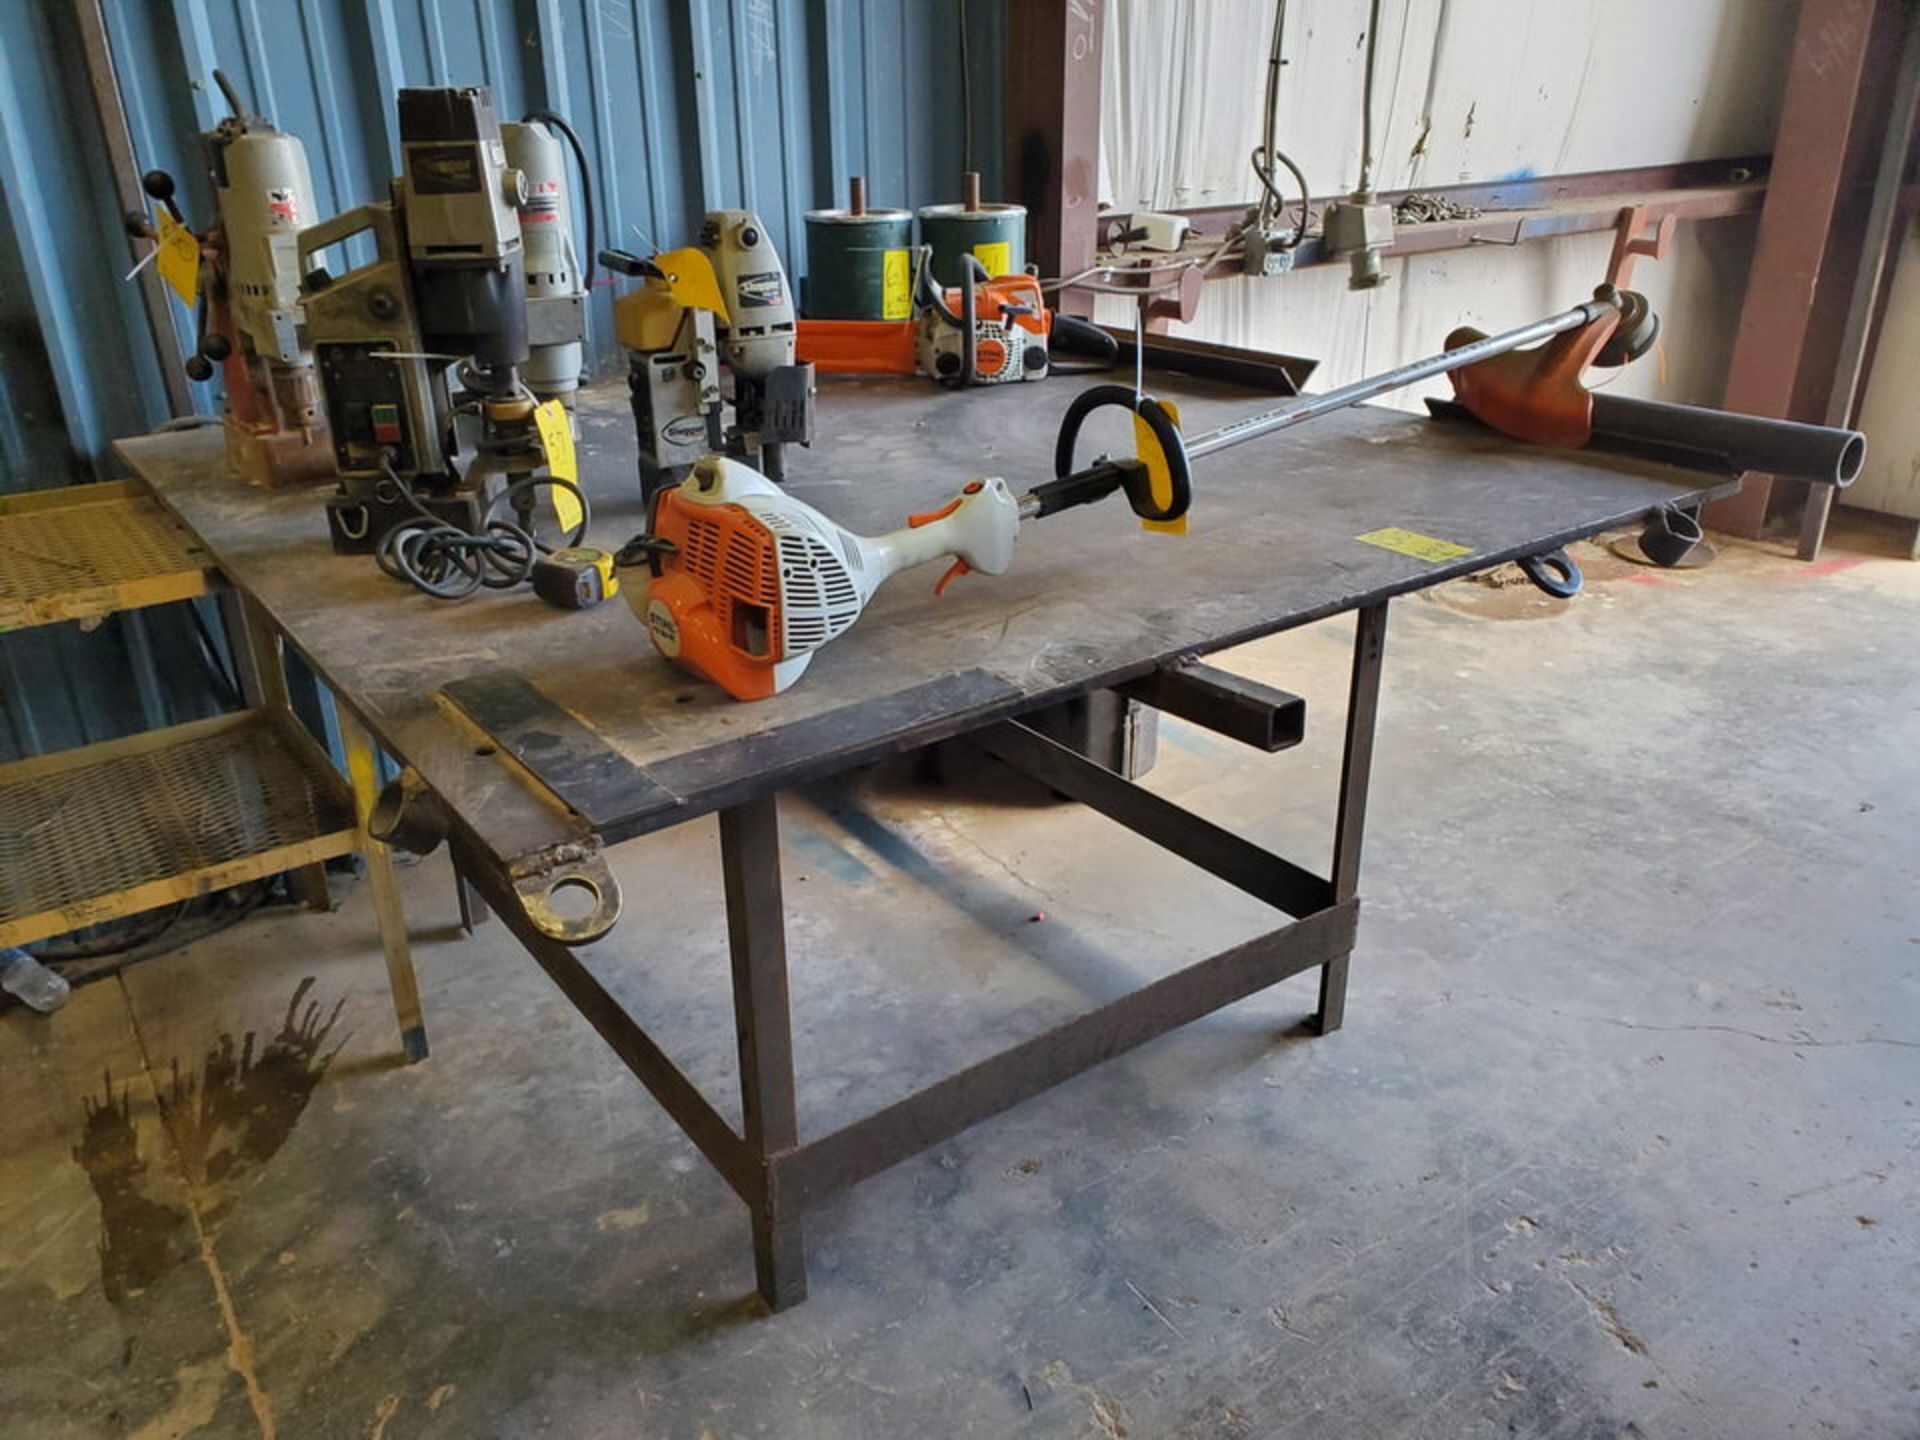 "(2) Stl Welding Tables (1) 72"" x 72"" x 37'H; (1) 51"" x 54"" x 37""H"